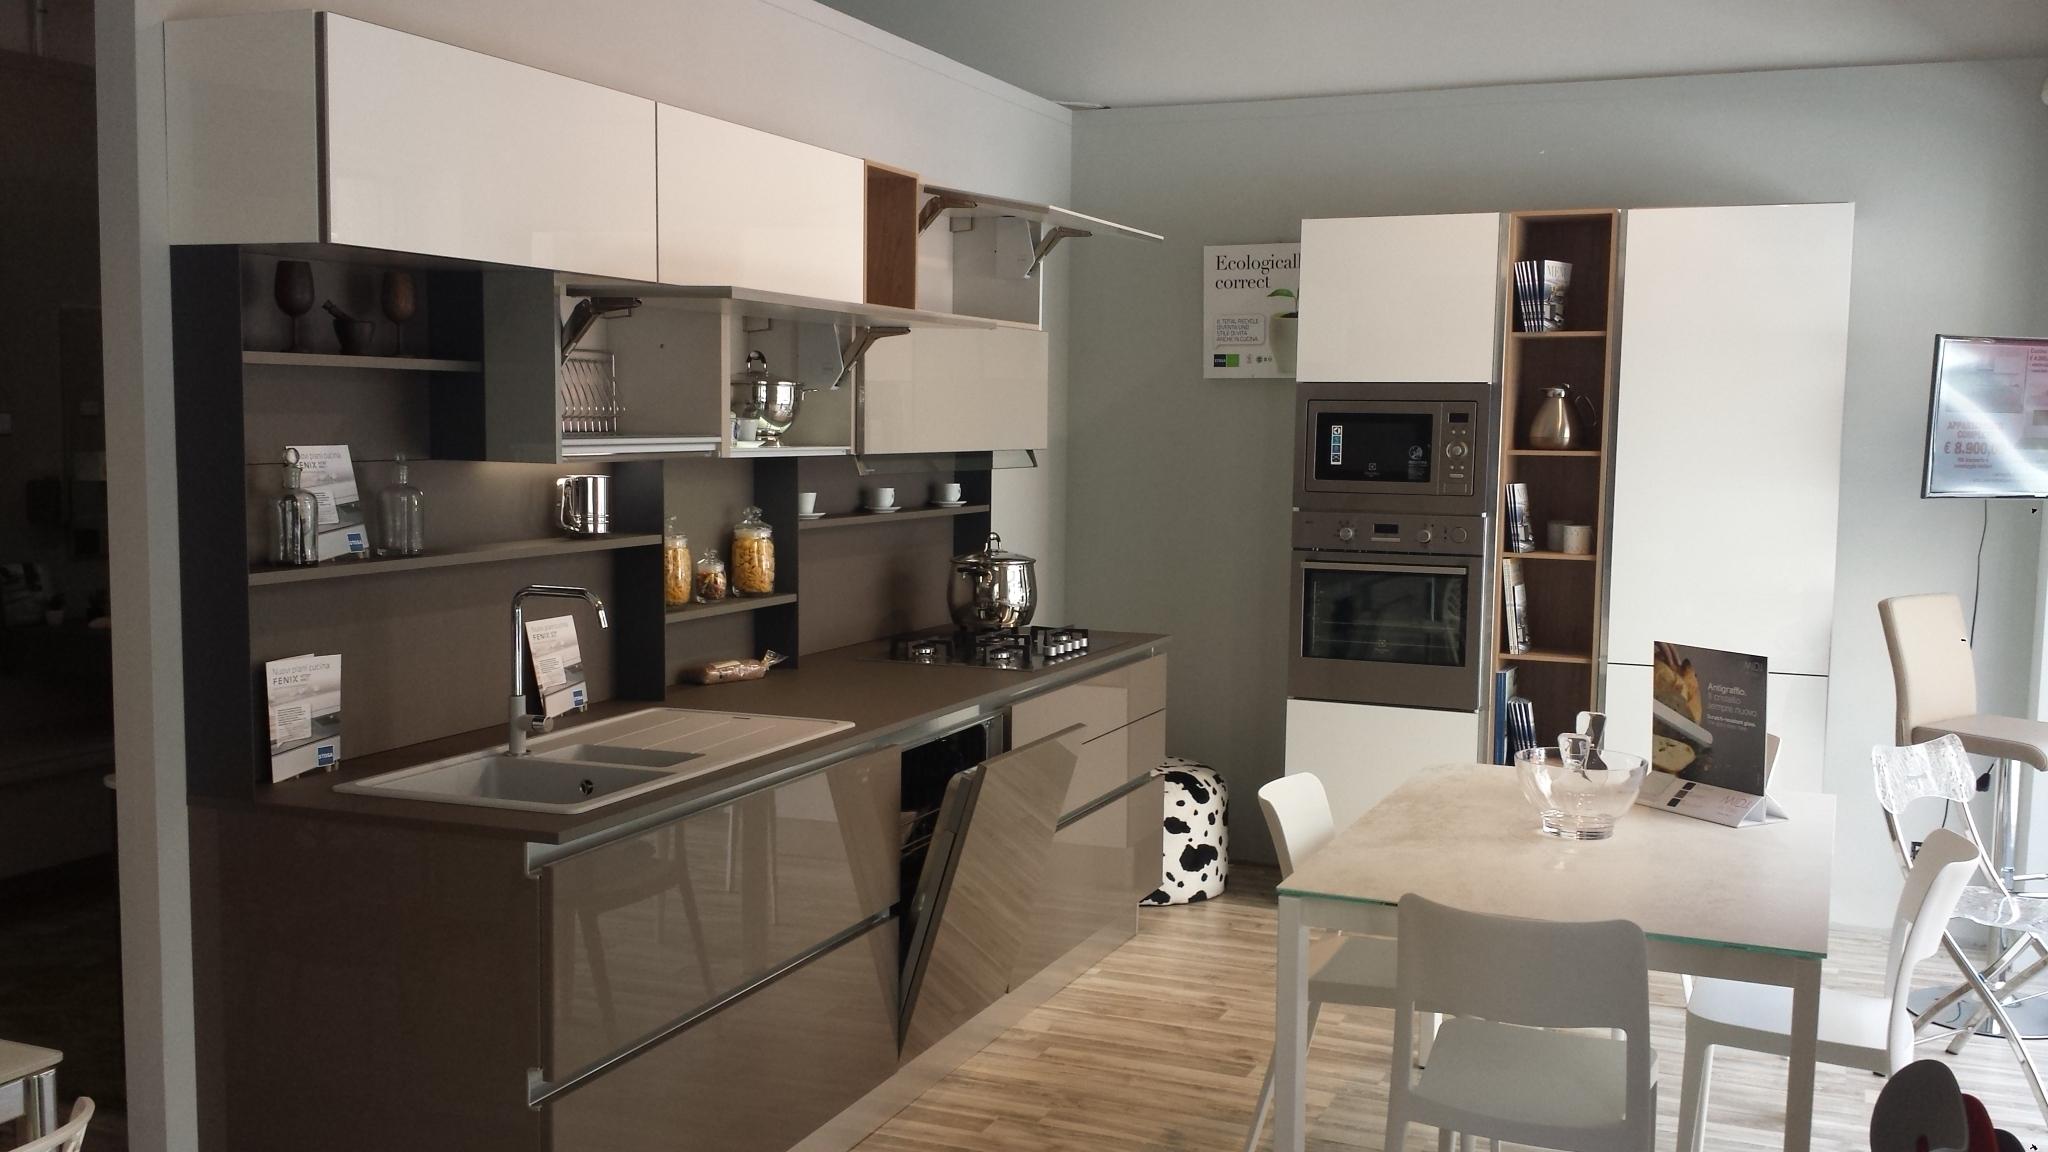 Cucina stosa cucine alev offerta esposizione cucine a for Stosa cucine verona